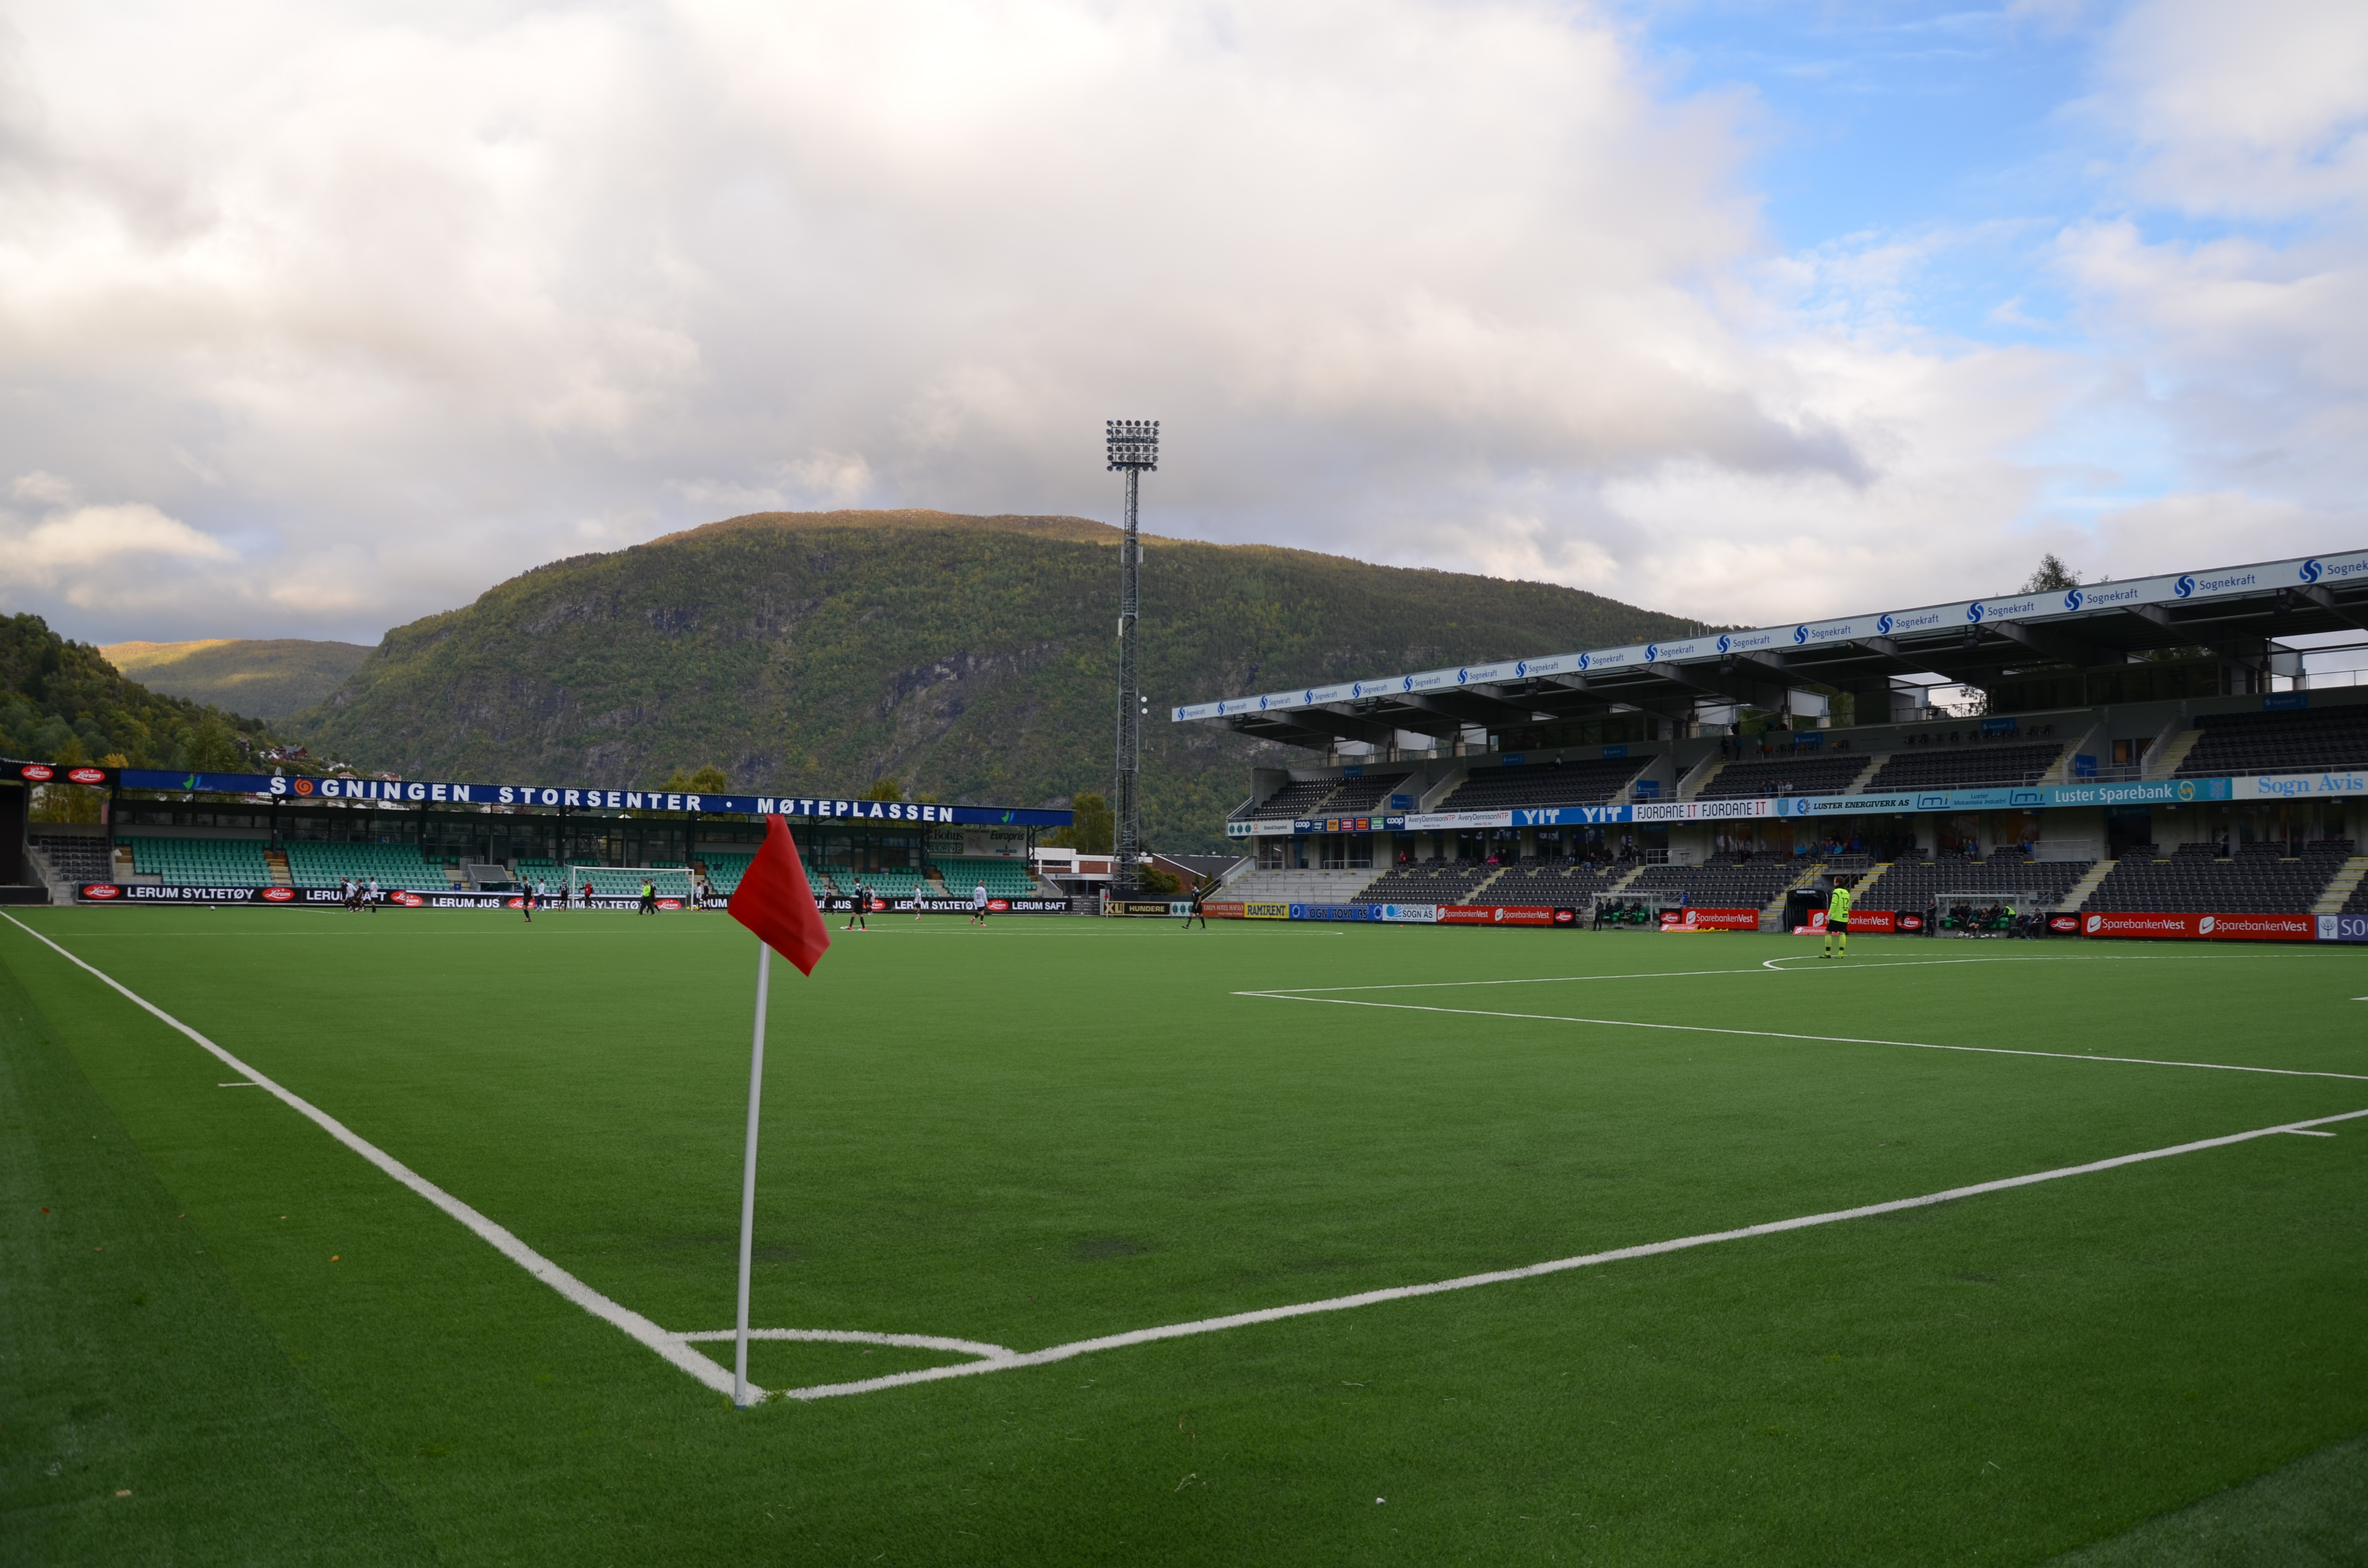 Fosshaugane stadion